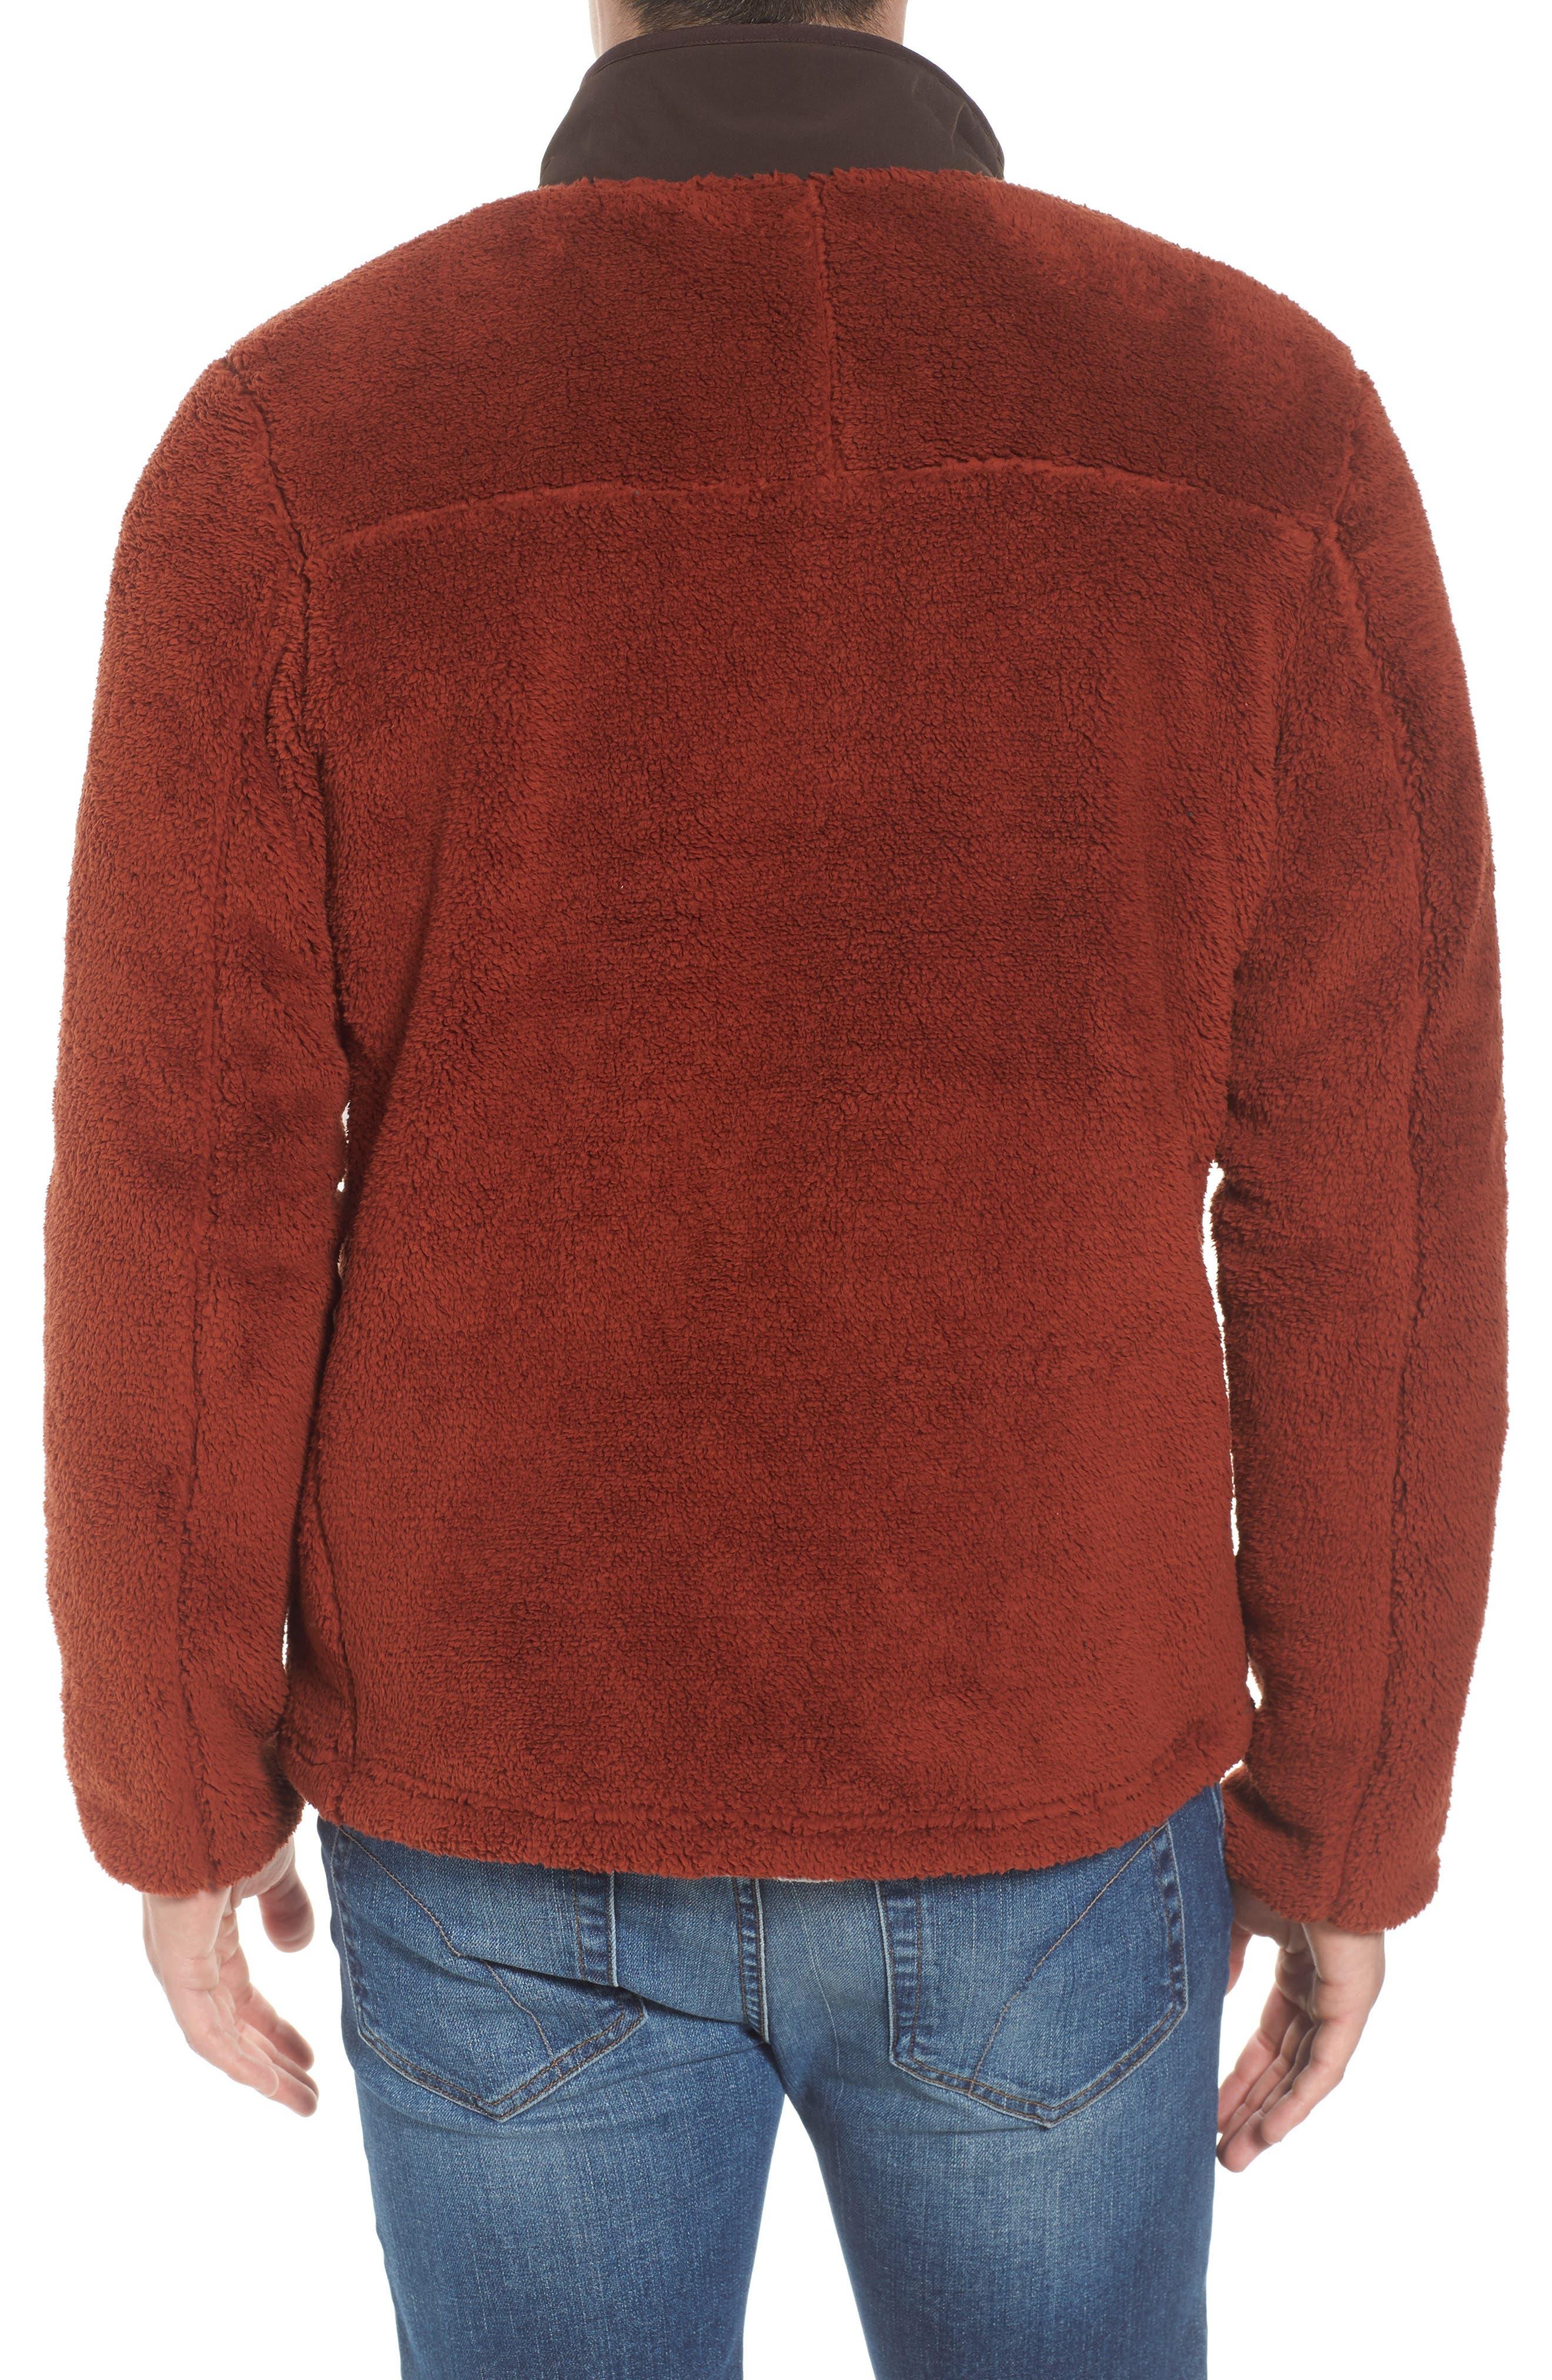 Campshire Zip Fleece Jacket,                             Alternate thumbnail 16, color,